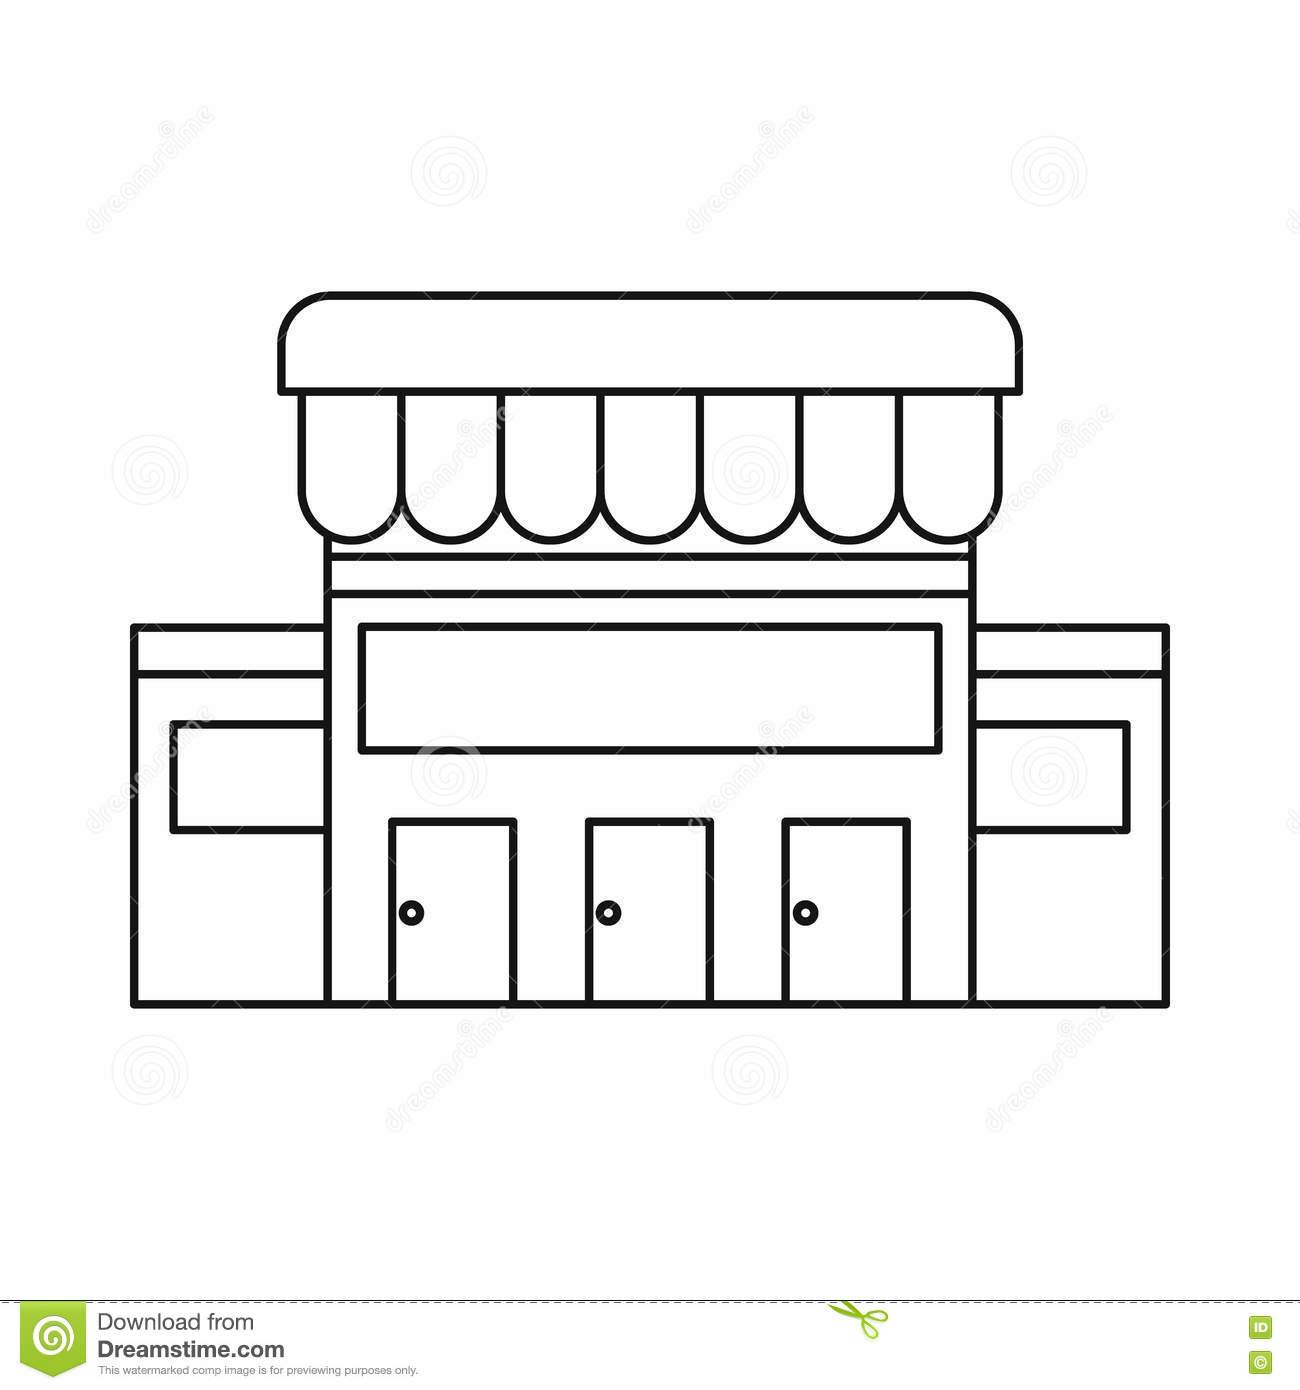 Buildings clipart outline. Supermarket building black and